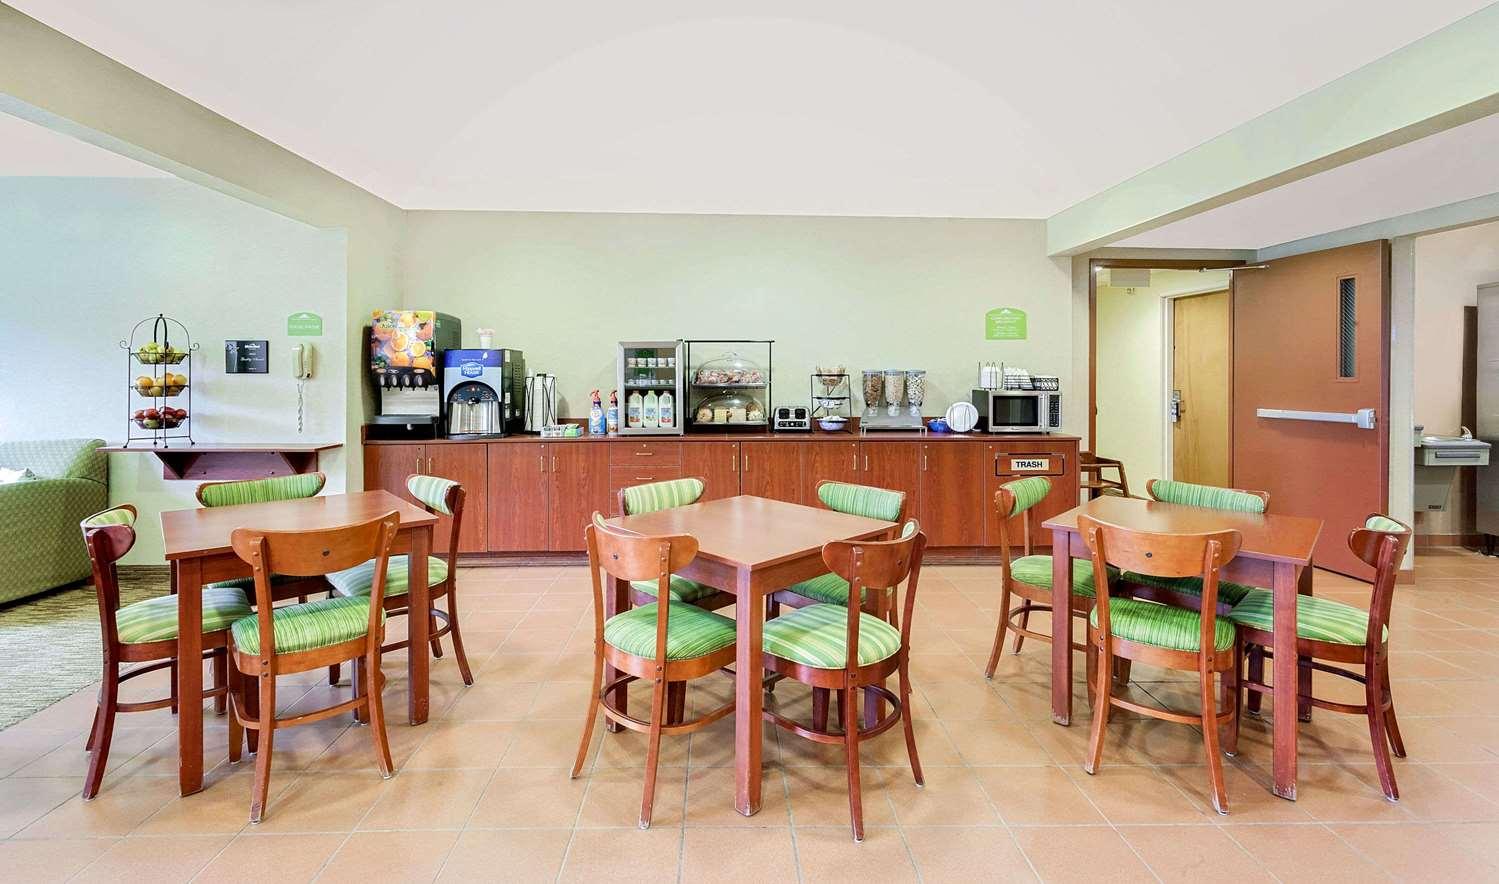 proam - Microtel Inn & Suites by Wyndham Wellsville